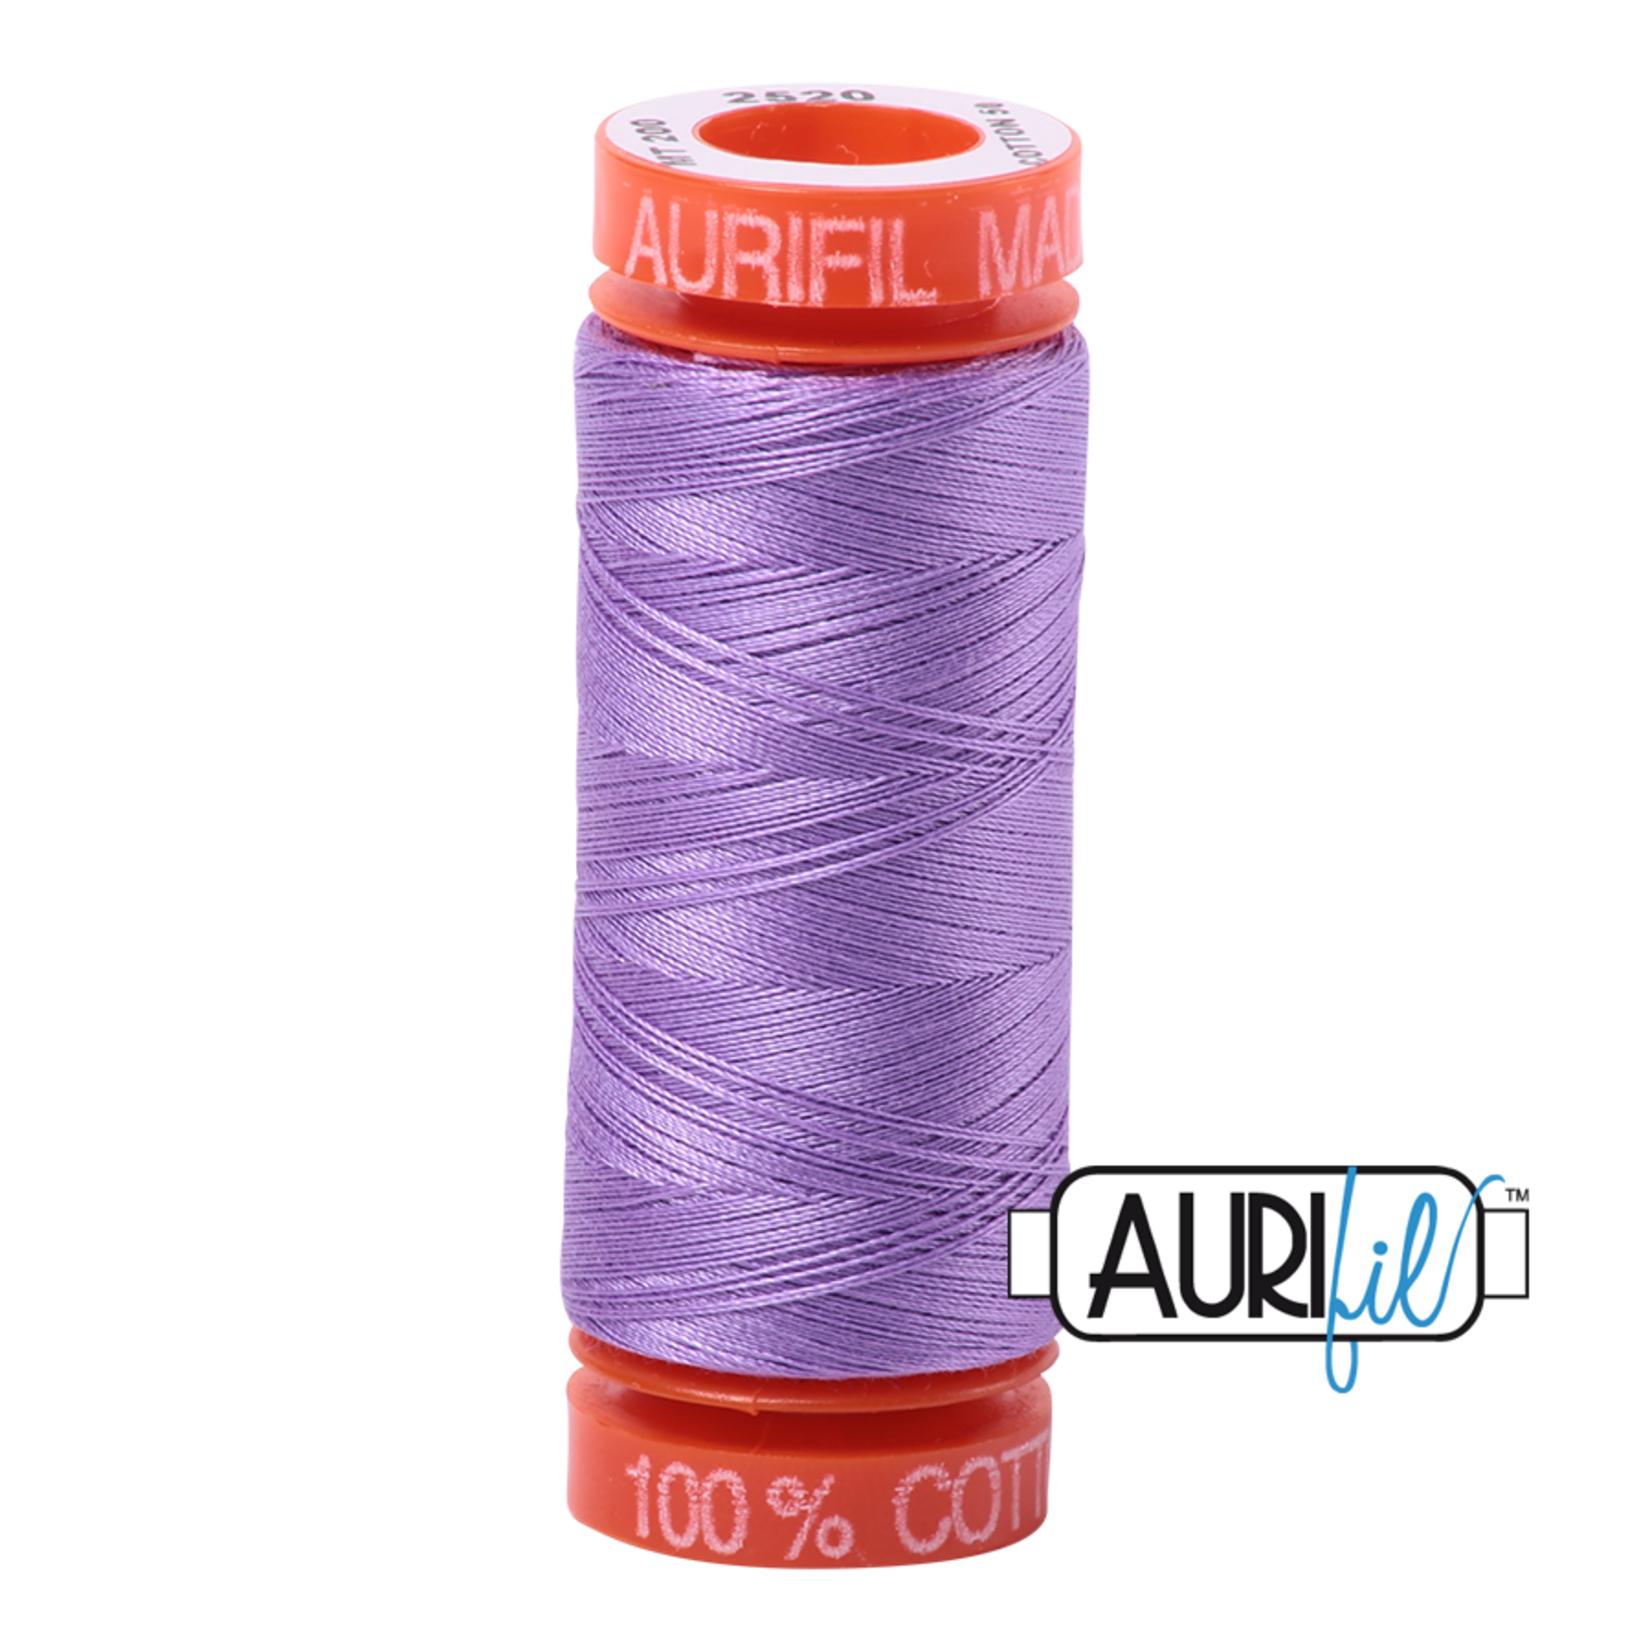 AURIFIL AURIFIL 50 WT Violet 2520 Small Spool